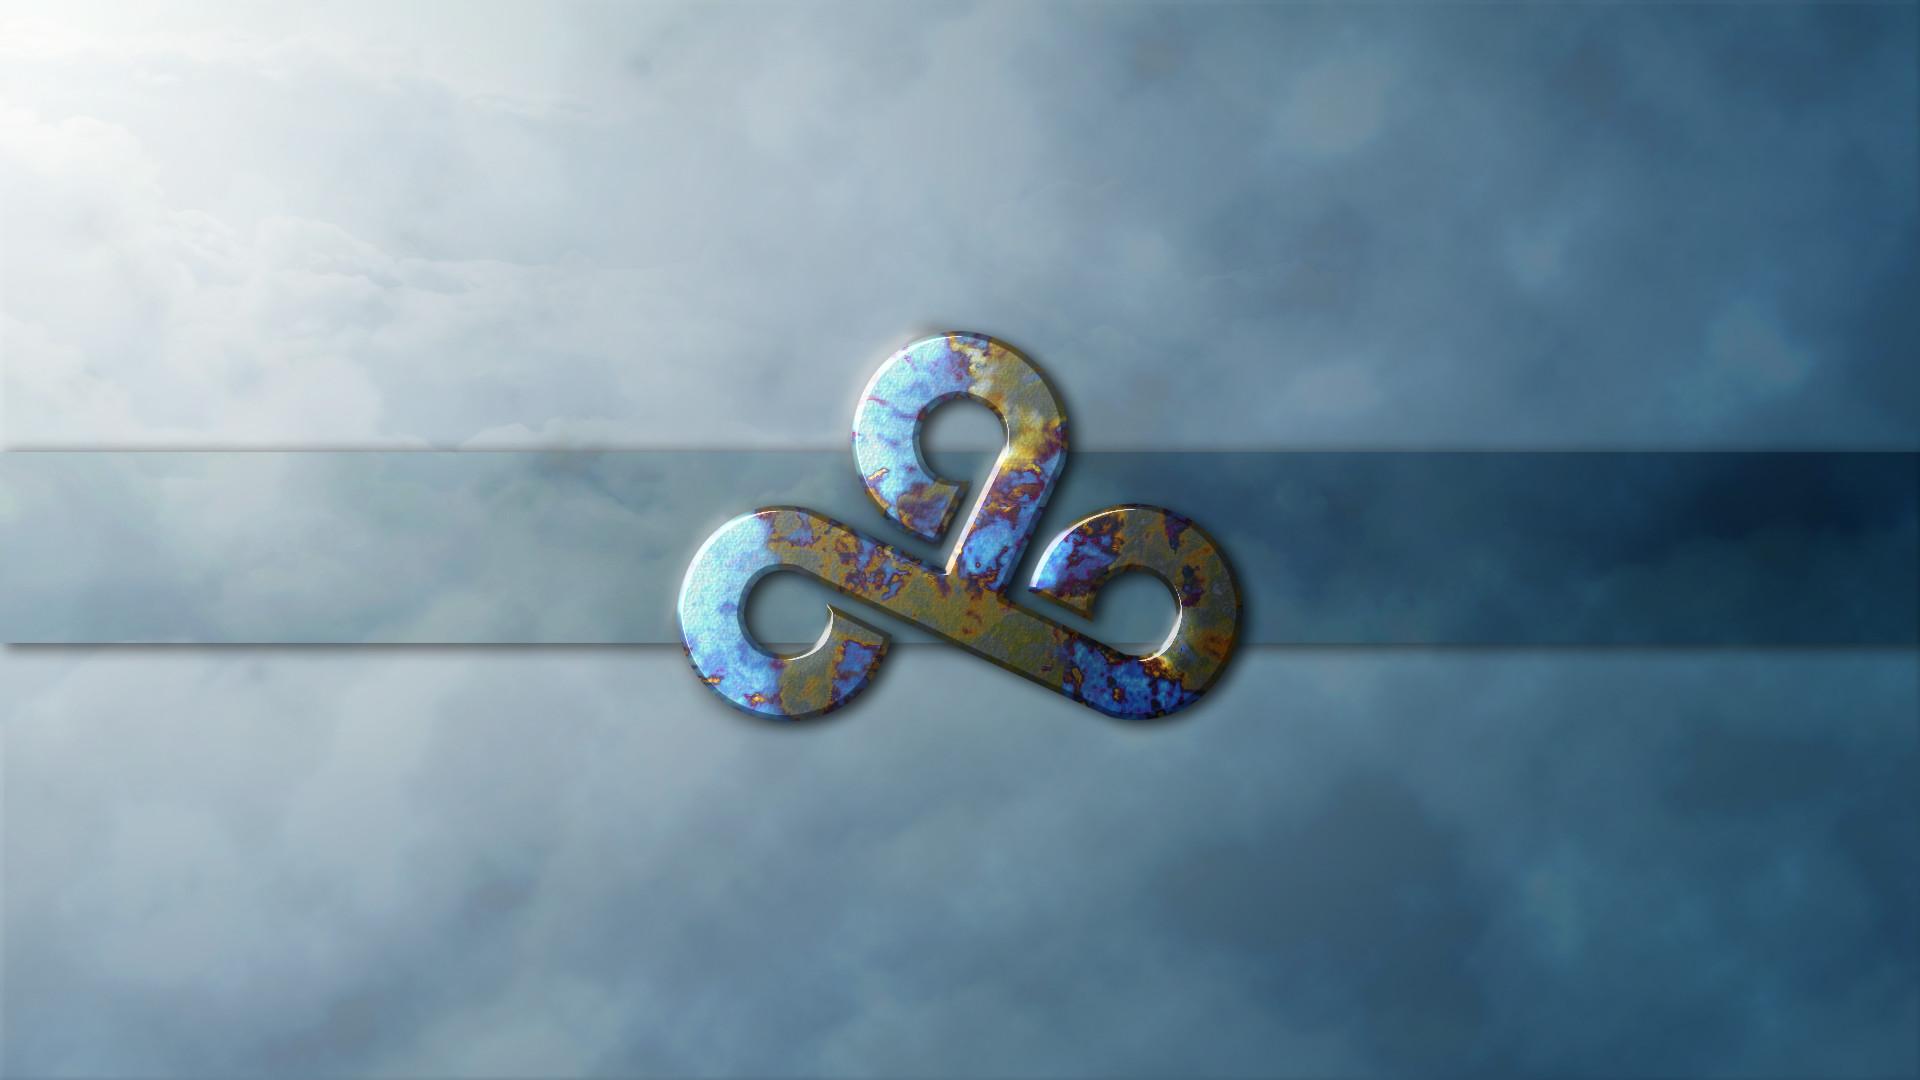 Cloud9 | Case Hardened